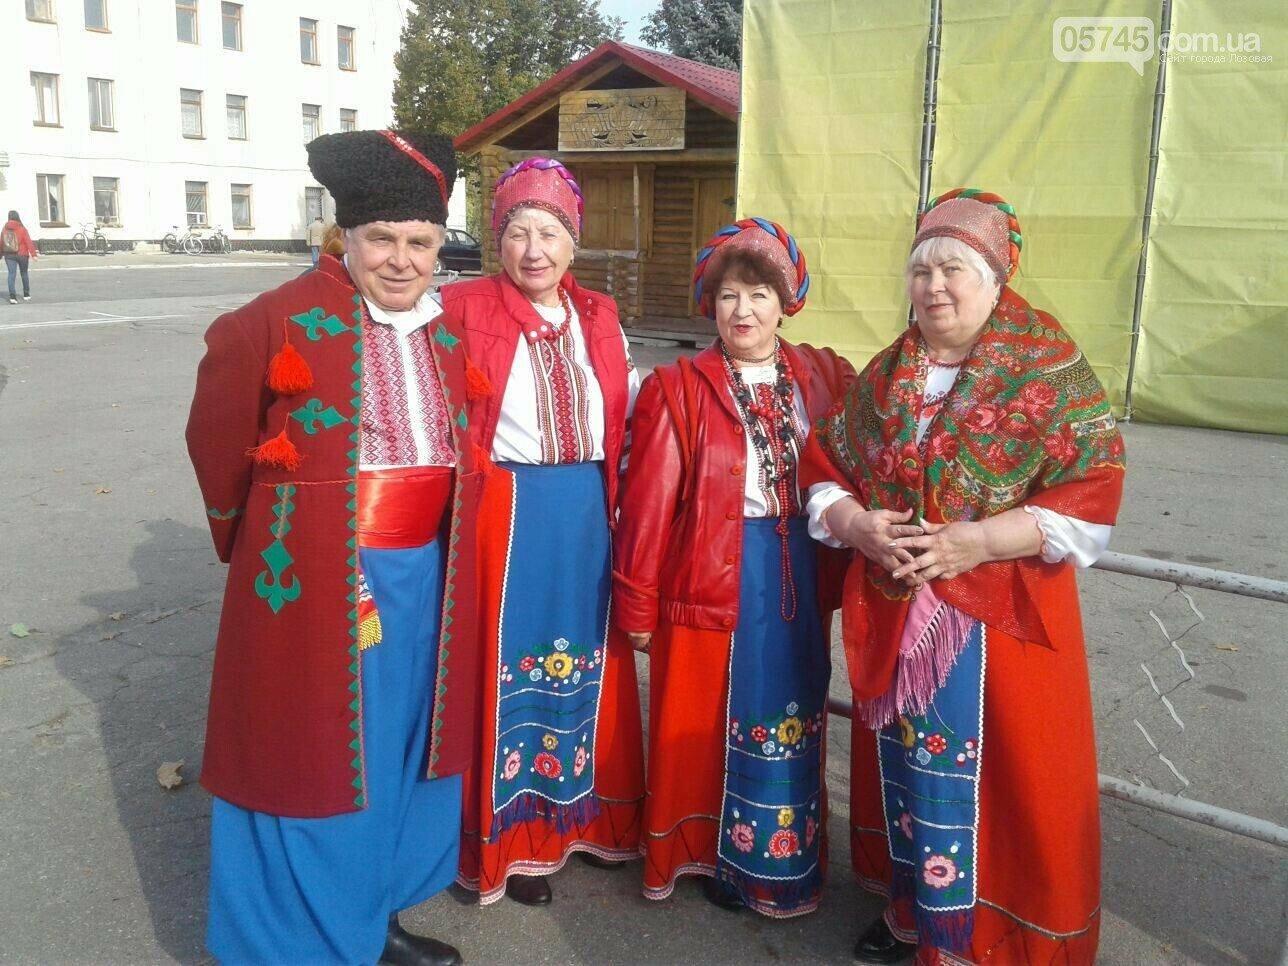 Без масок и карантина: как Лозовщина праздновала День защитника Украины год назад (ФОТО), фото-13